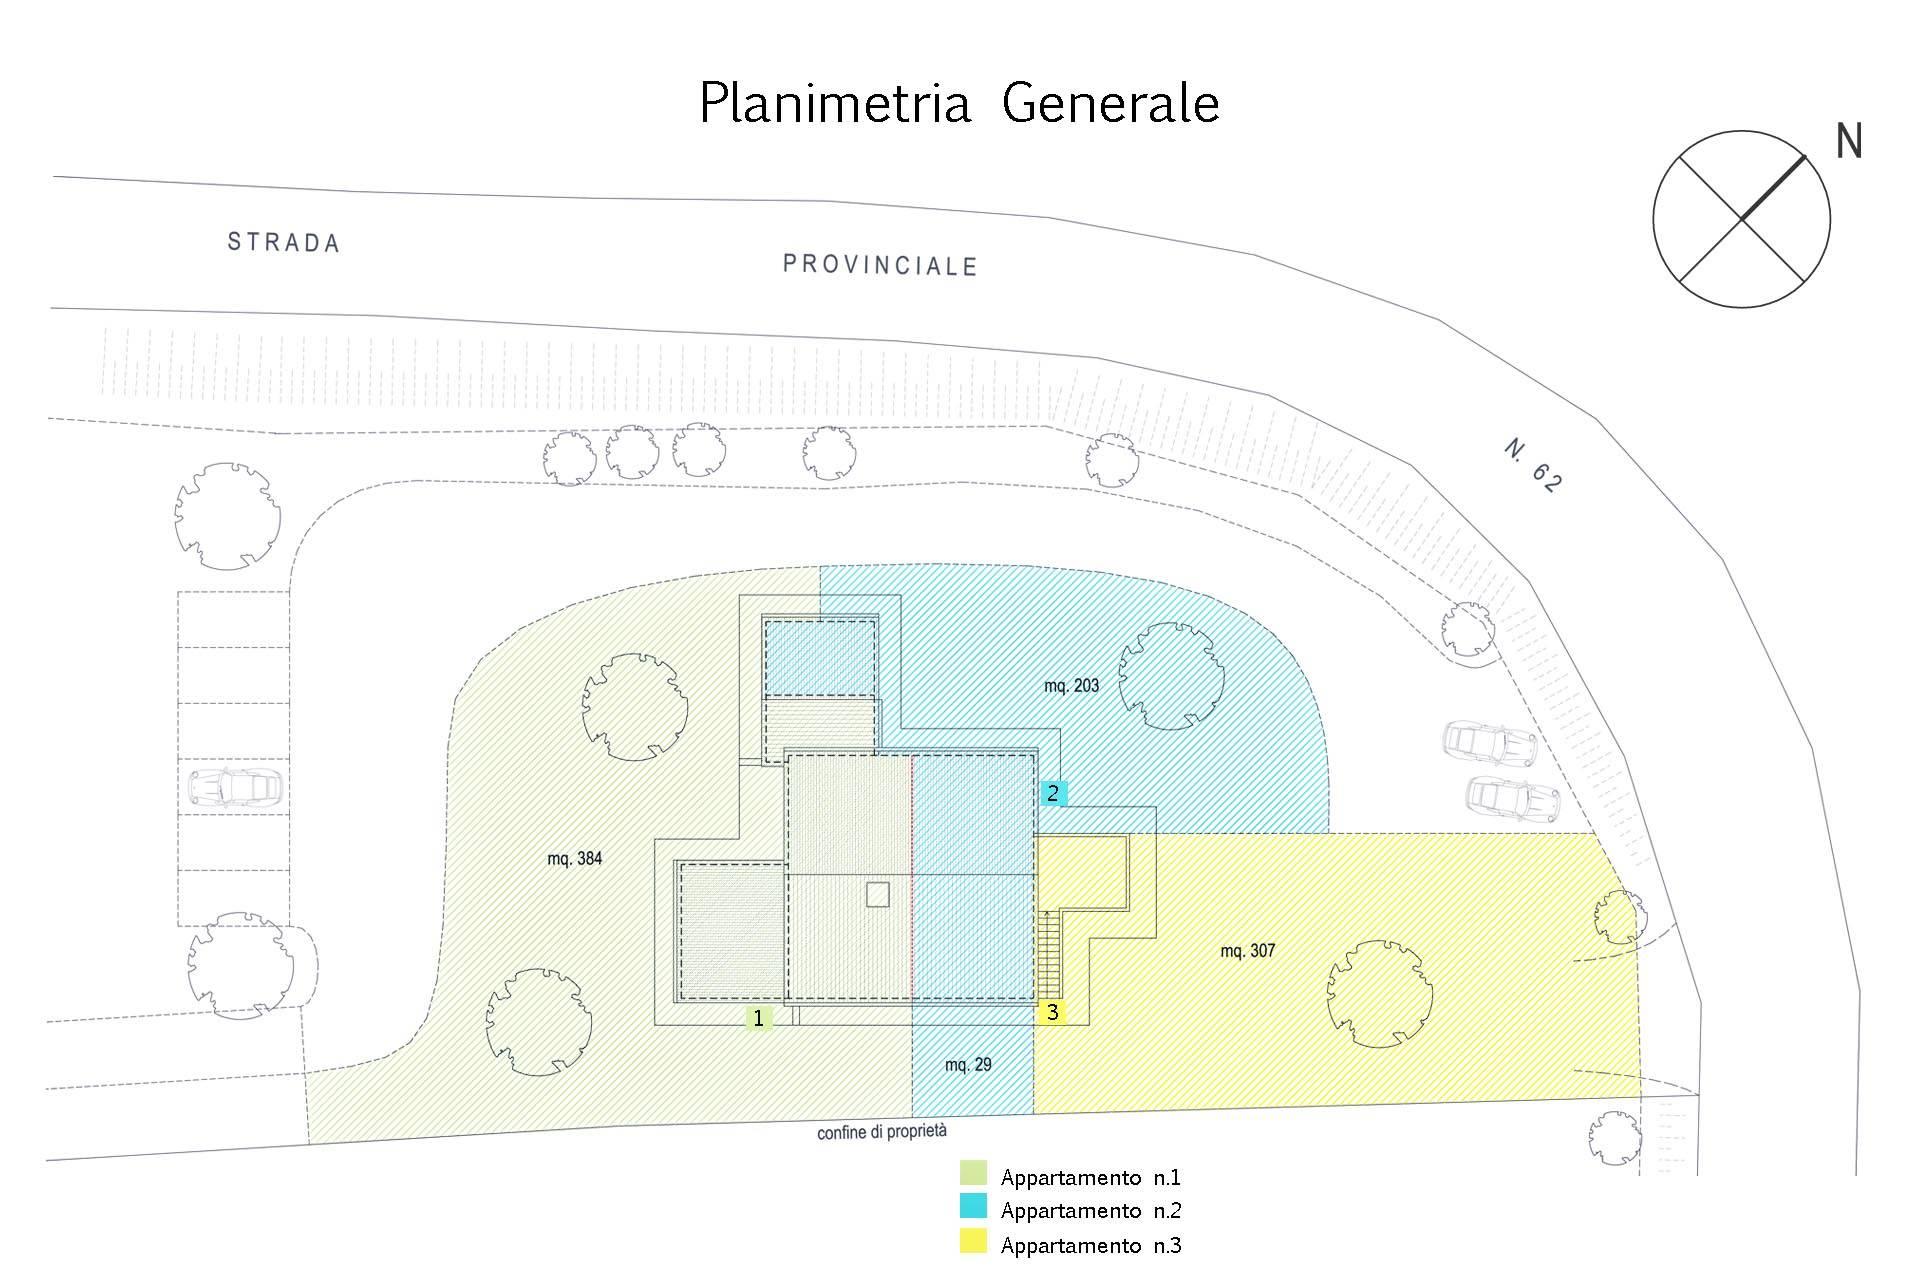 3893_planimetria generale